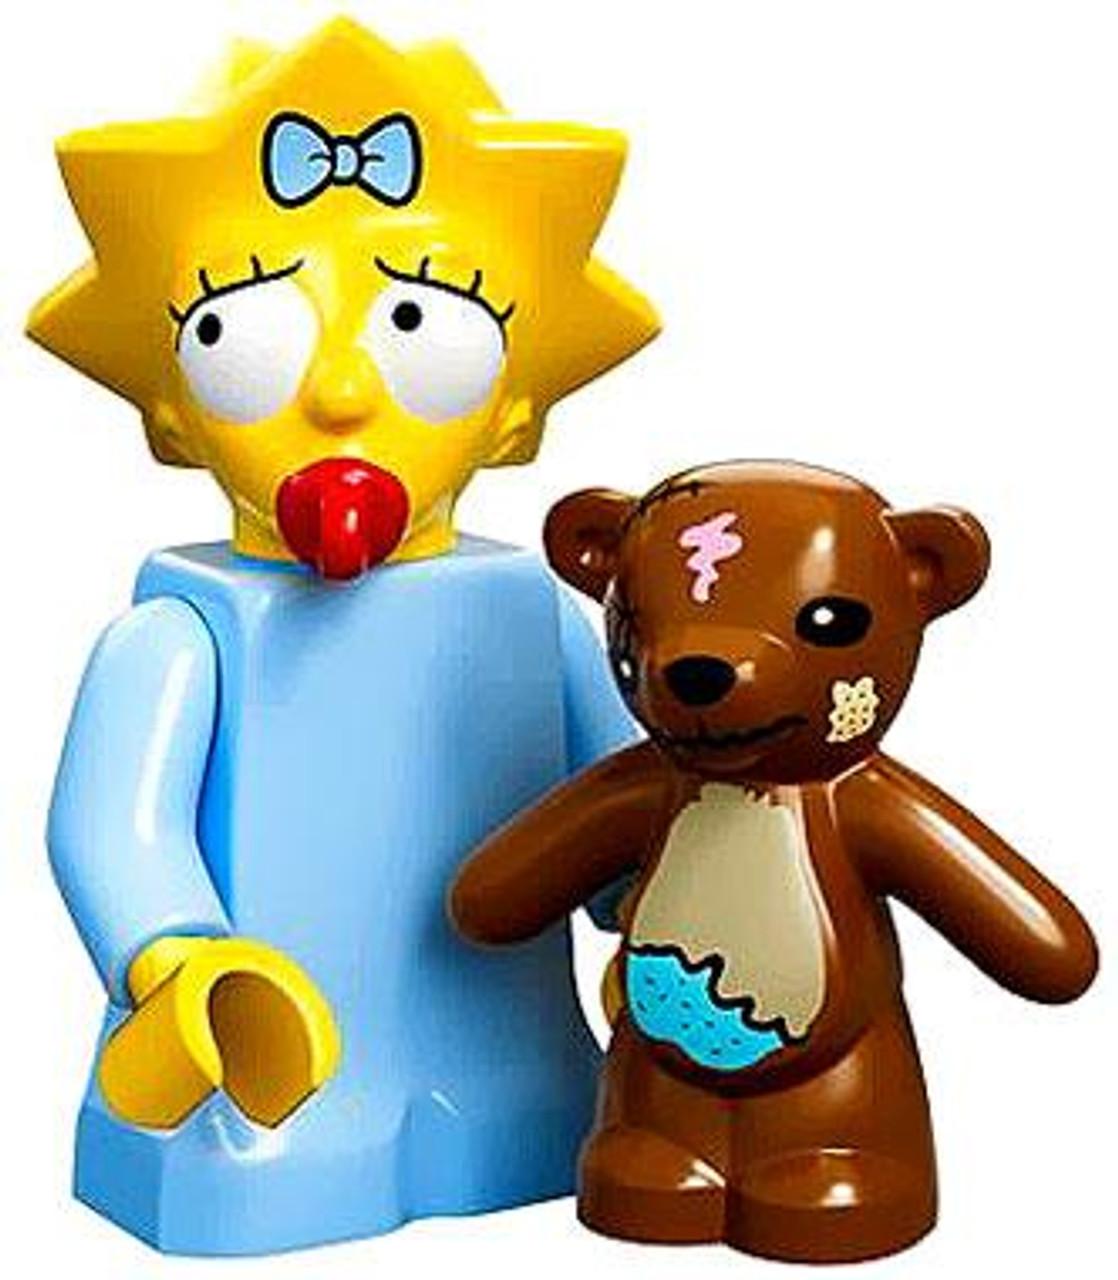 LEGO The Simpsons Simpsons Series 1 Maggie Simpson Minifigure [Loose]